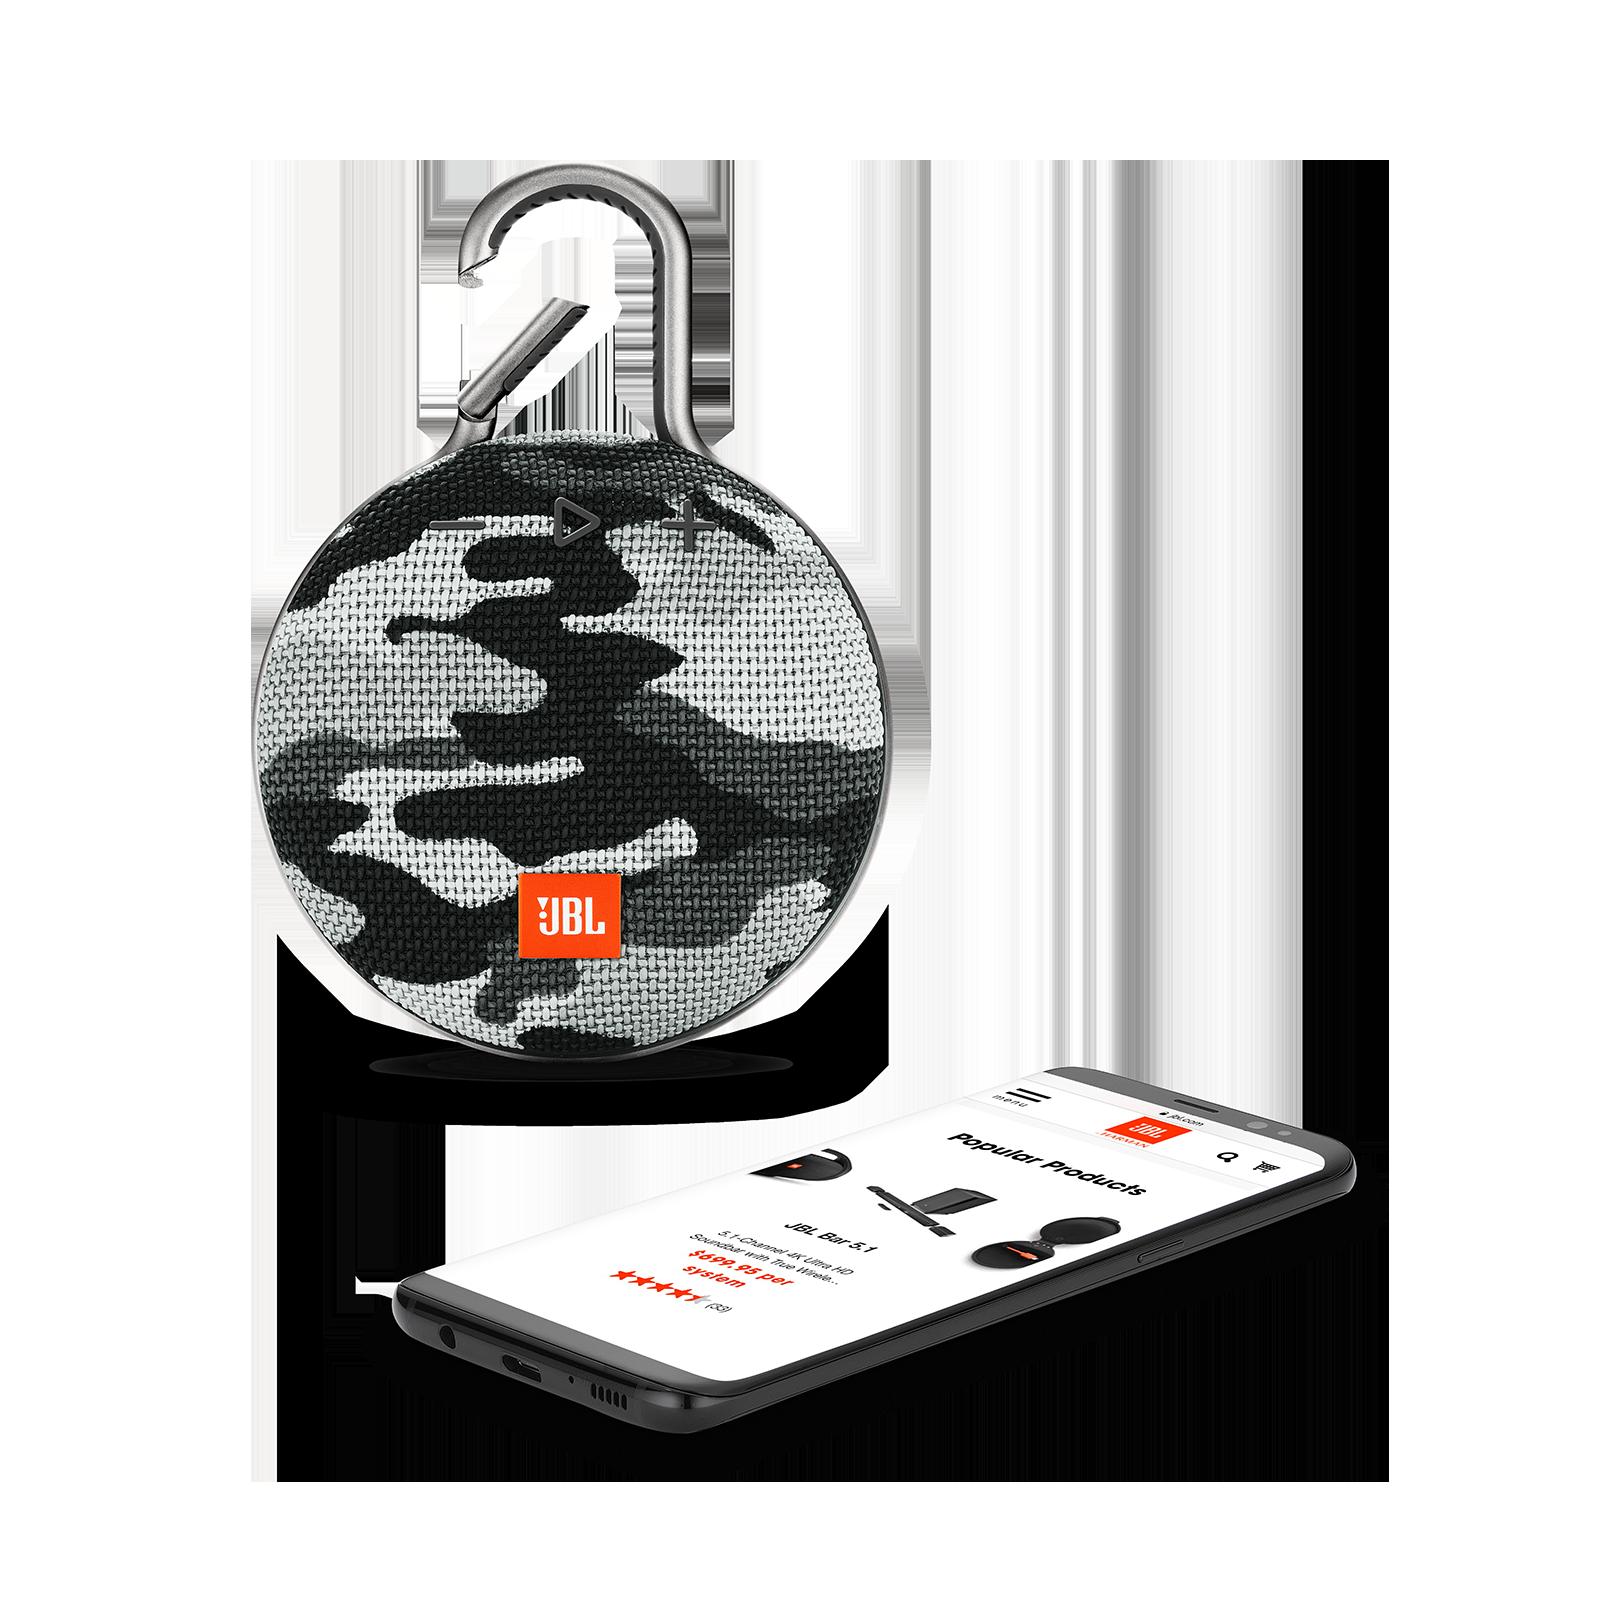 JBL CLIP 3 - Black/White Camouflage - Portable Bluetooth® speaker - Detailshot 1